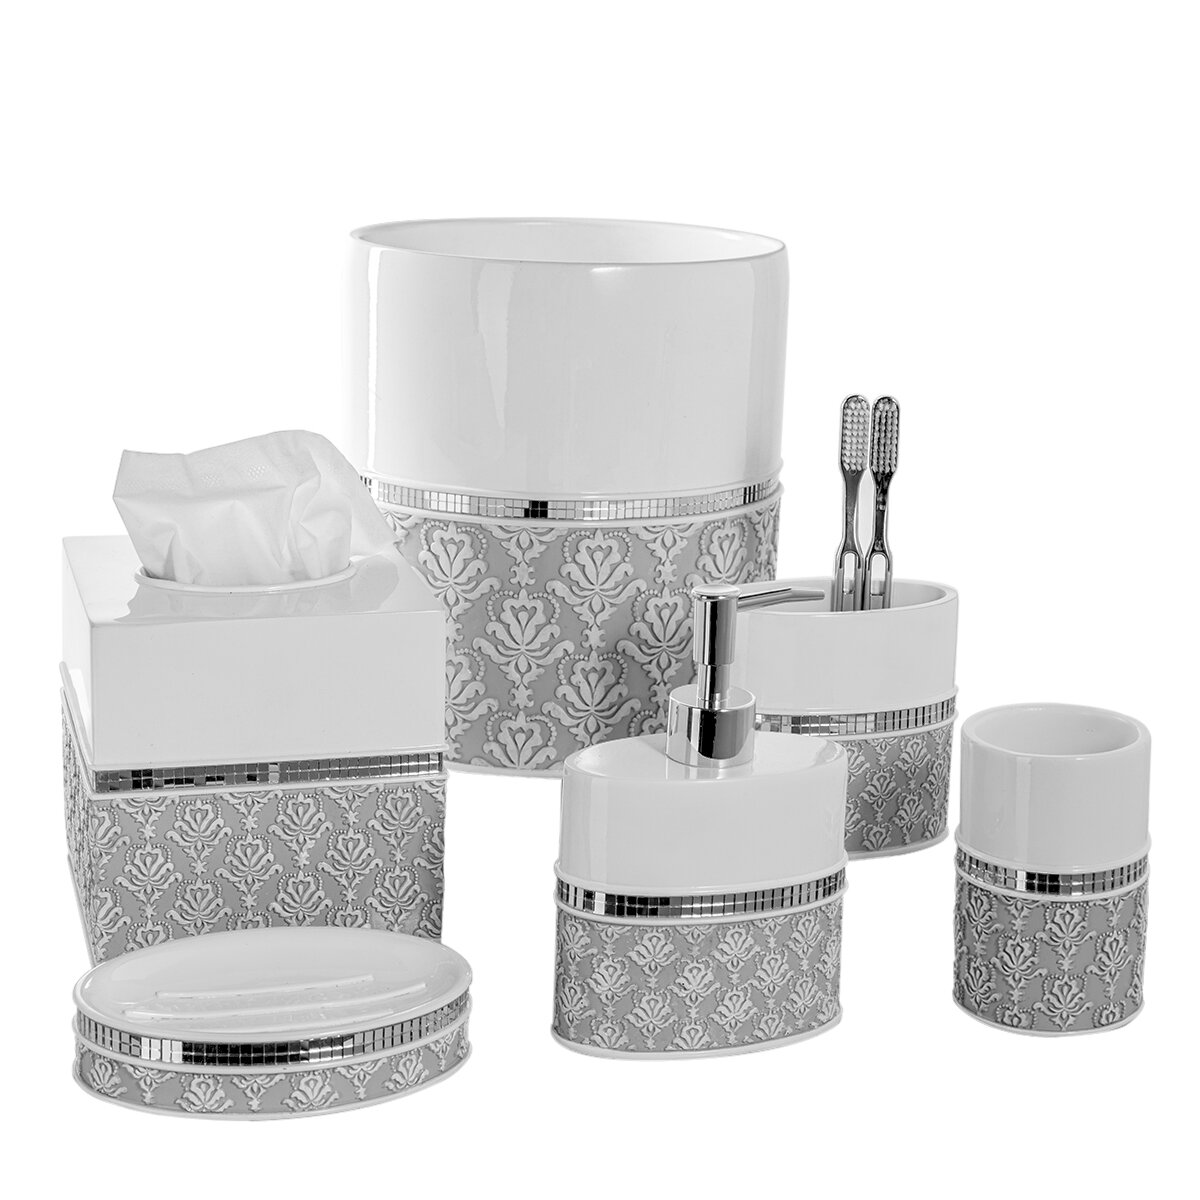 black crackle bathroom accessories. Creative Scents 6 Piece Bathroom Accessory Set Wayfair  Crackle Glass Accessories dact us